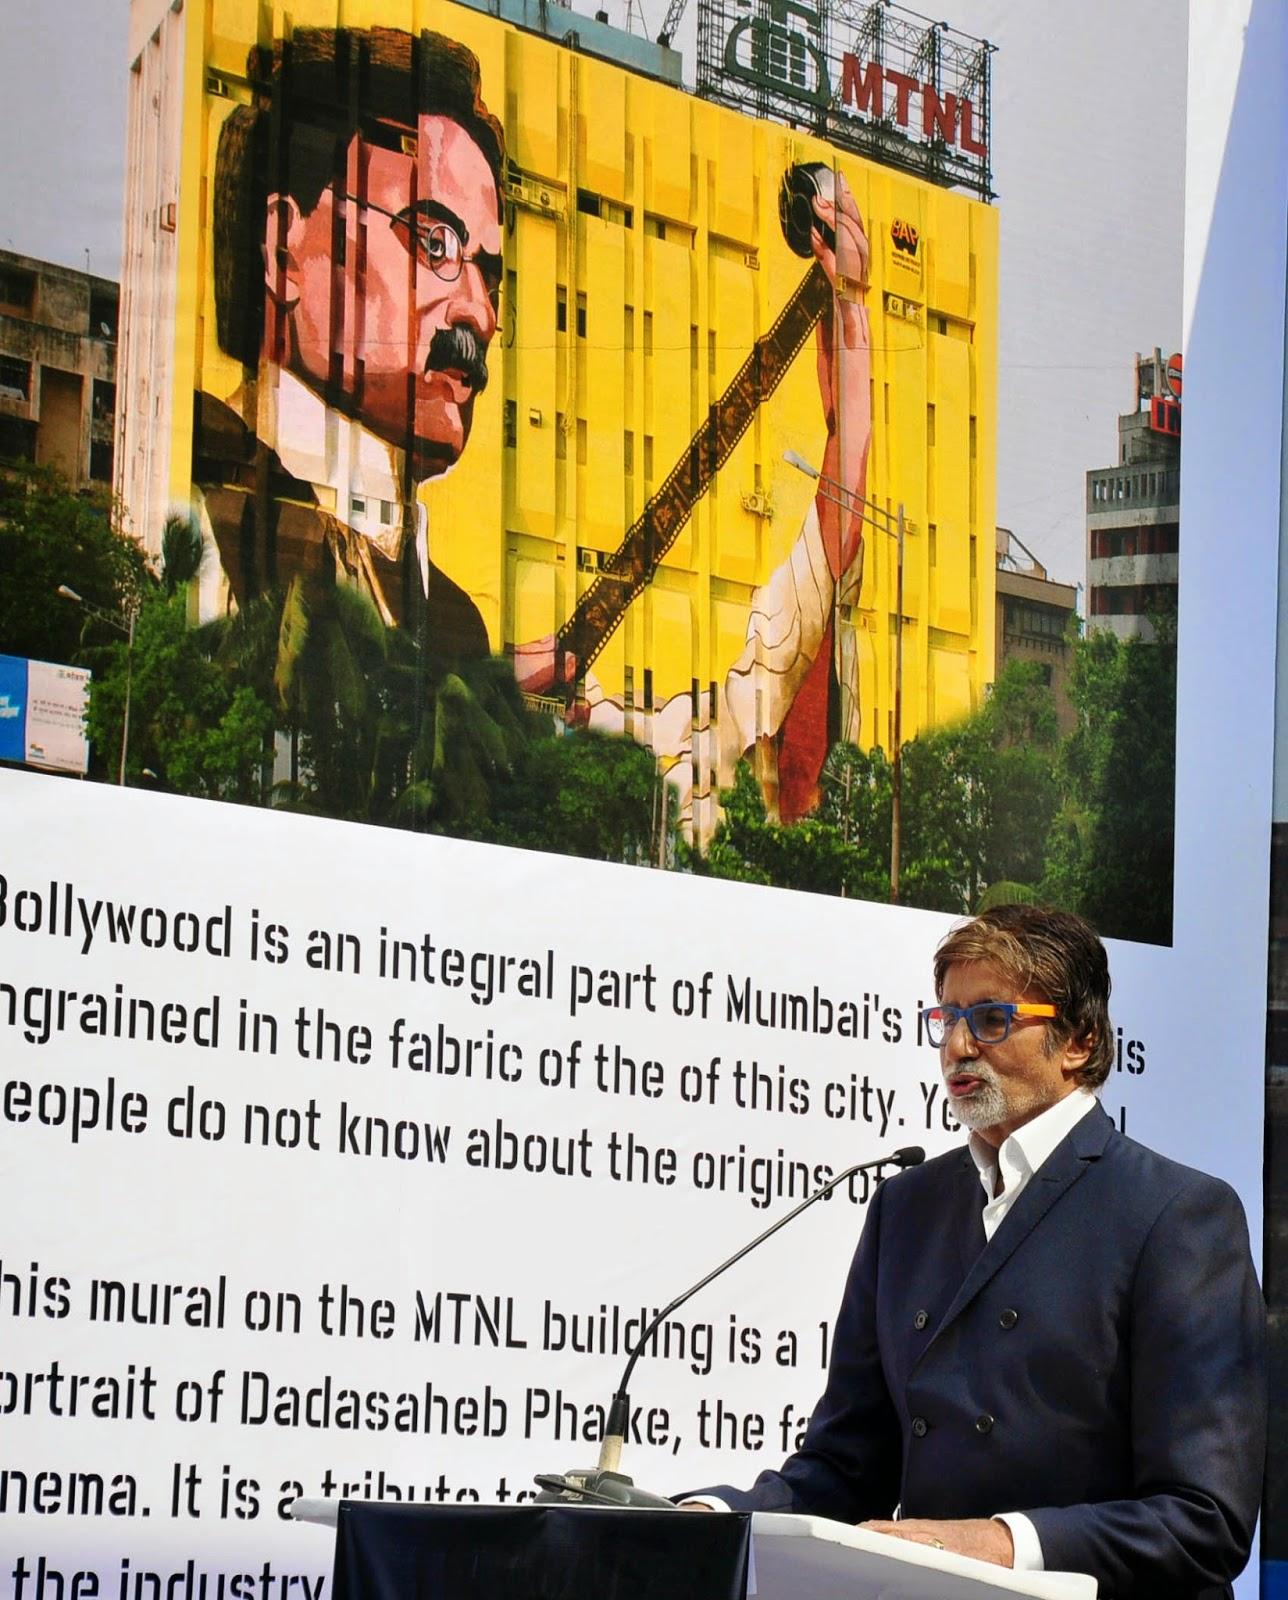 Amitabh Bachchan unveiled the mural of the father of Indian Cinema Dadasaheb Phalke in Mumbai